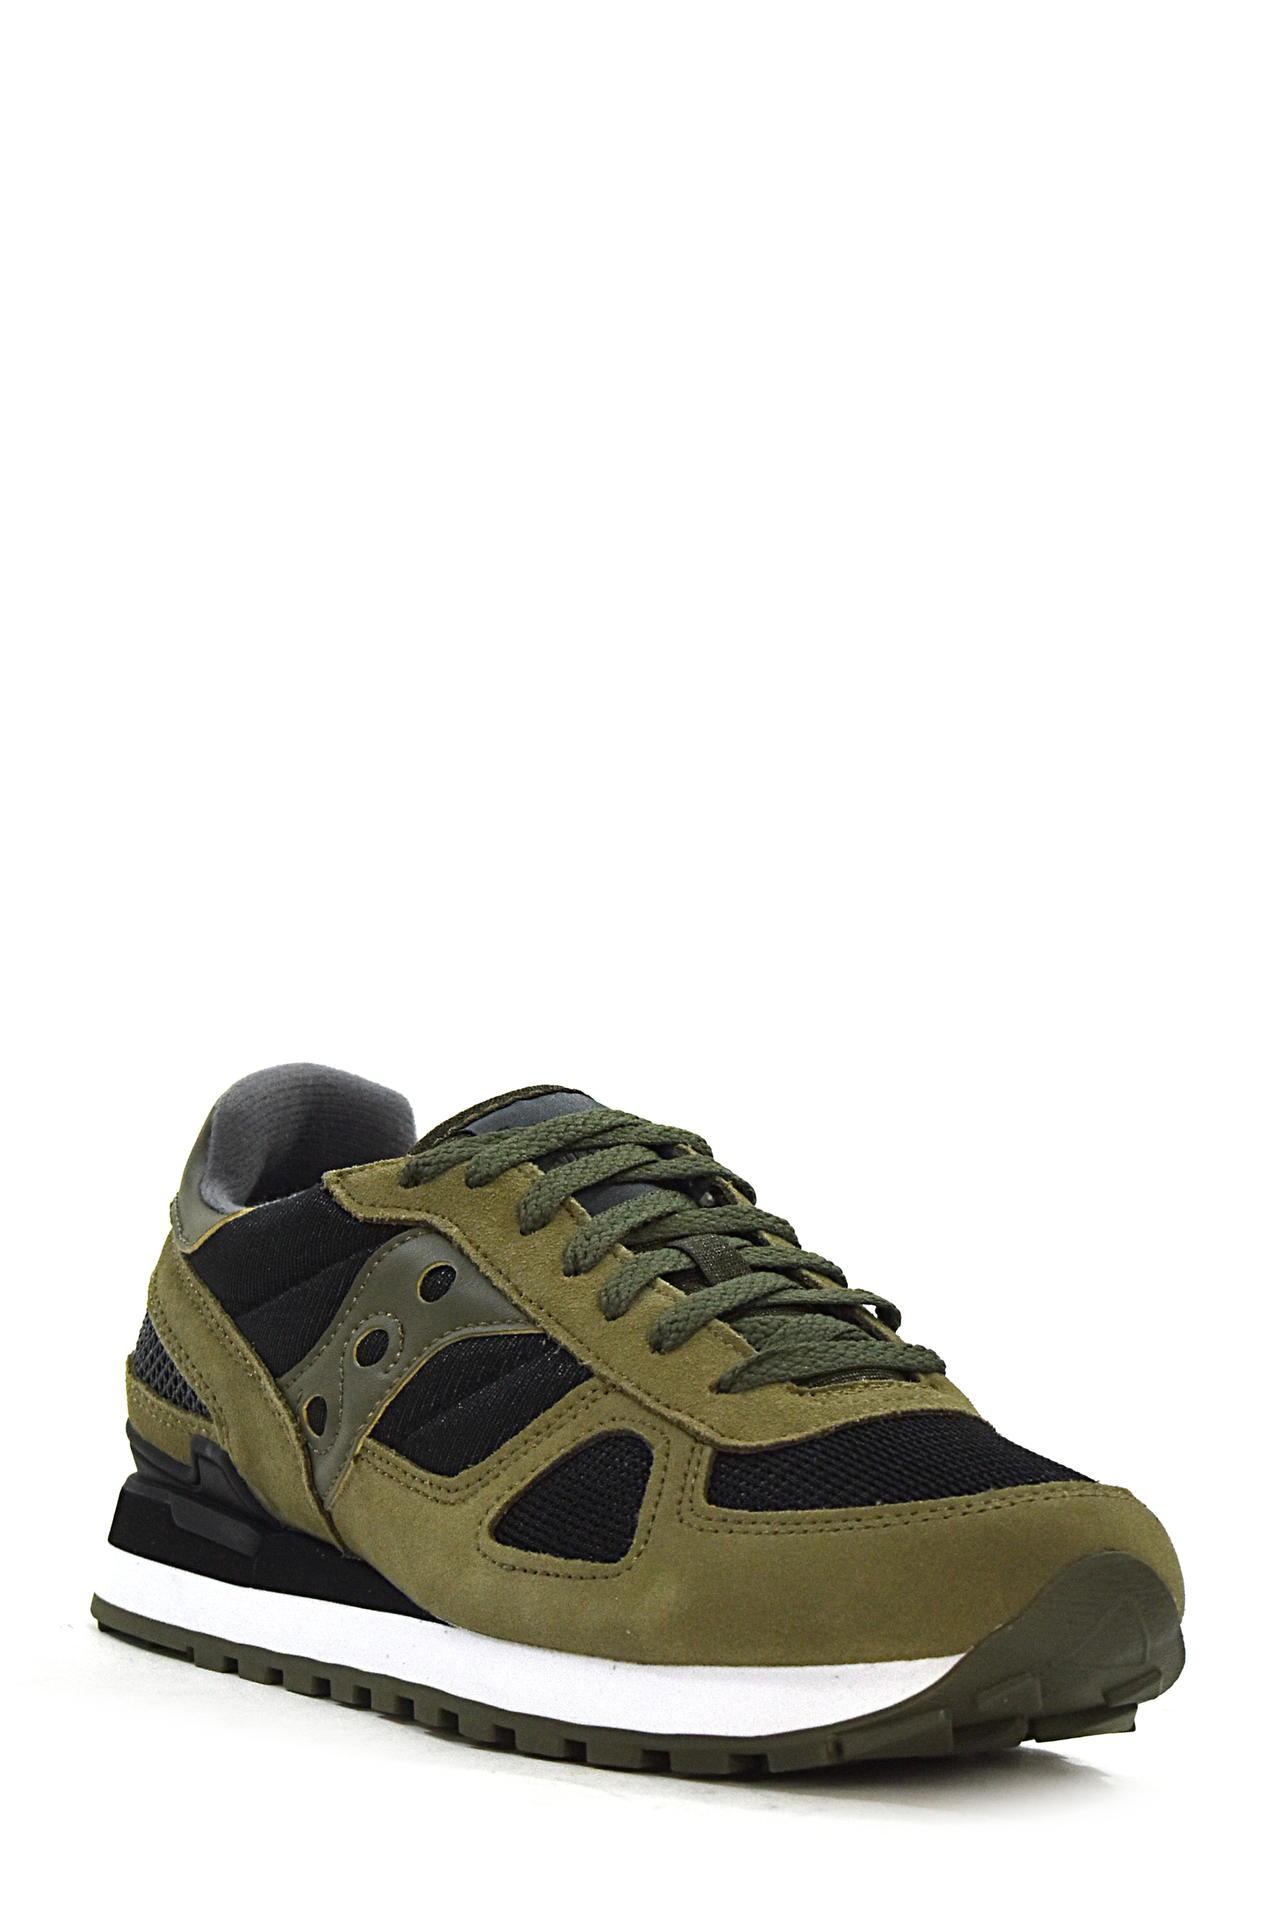 AML018/_SAUC Scarpe Sneakers SAUCONY Uomo Militare